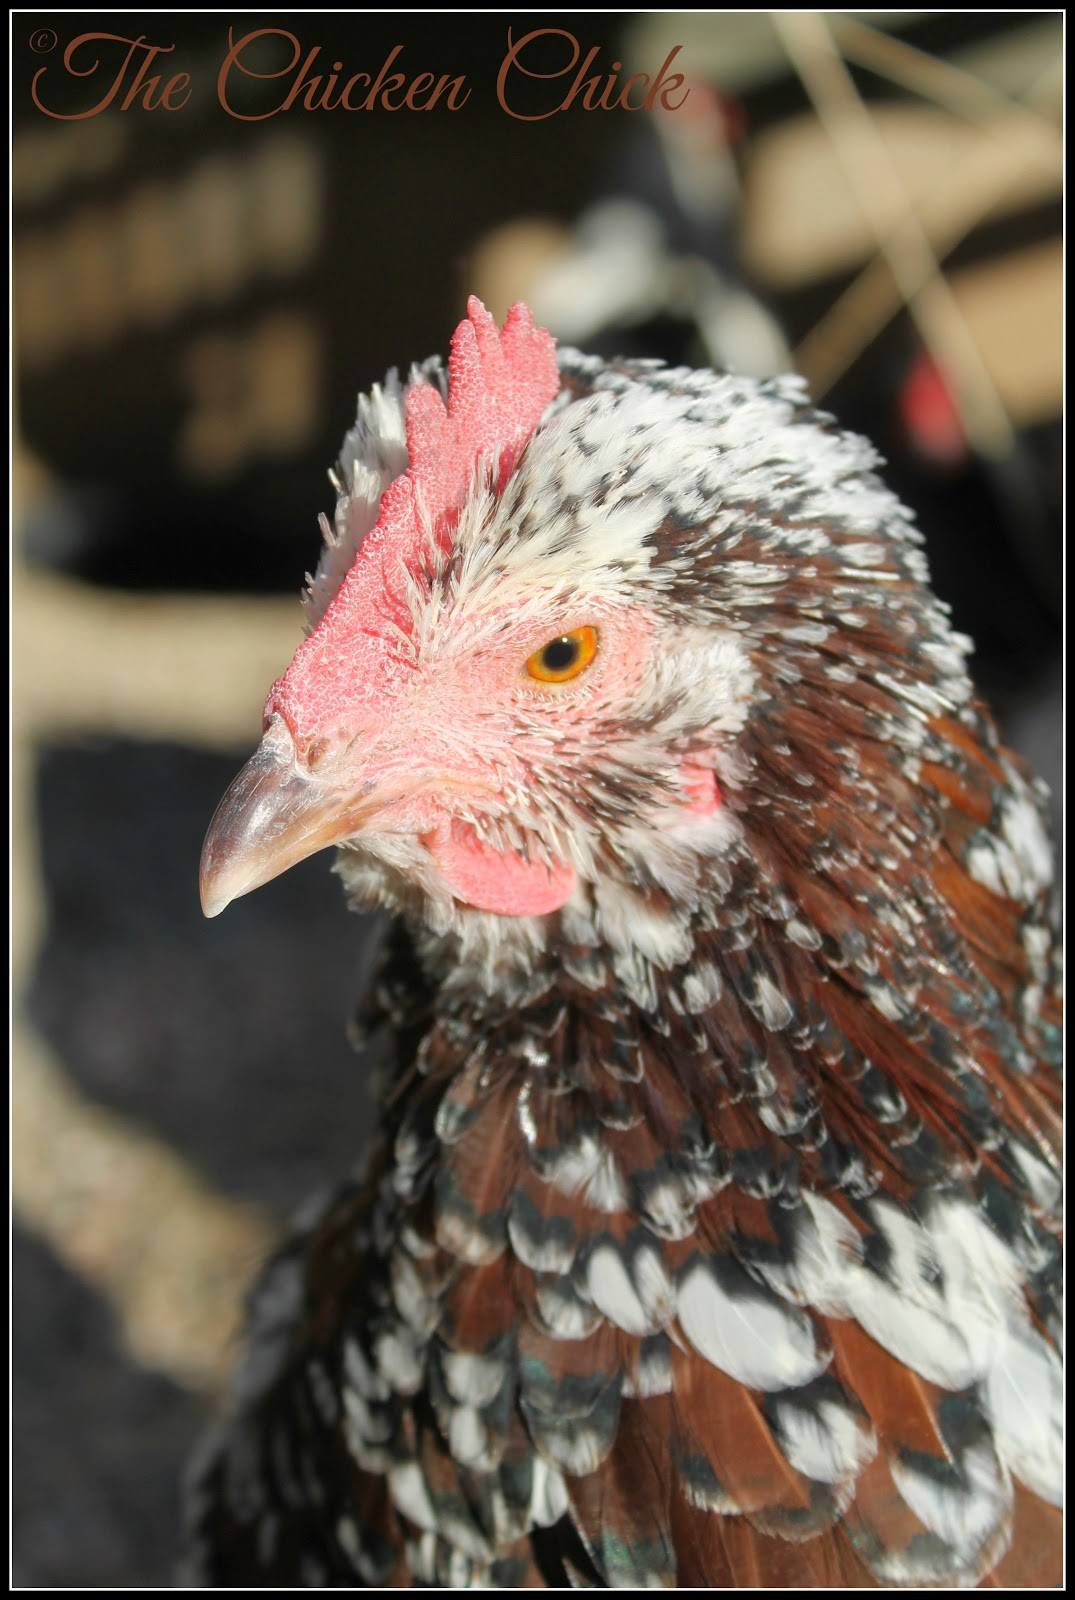 Kate-Speckled Sussex hen.